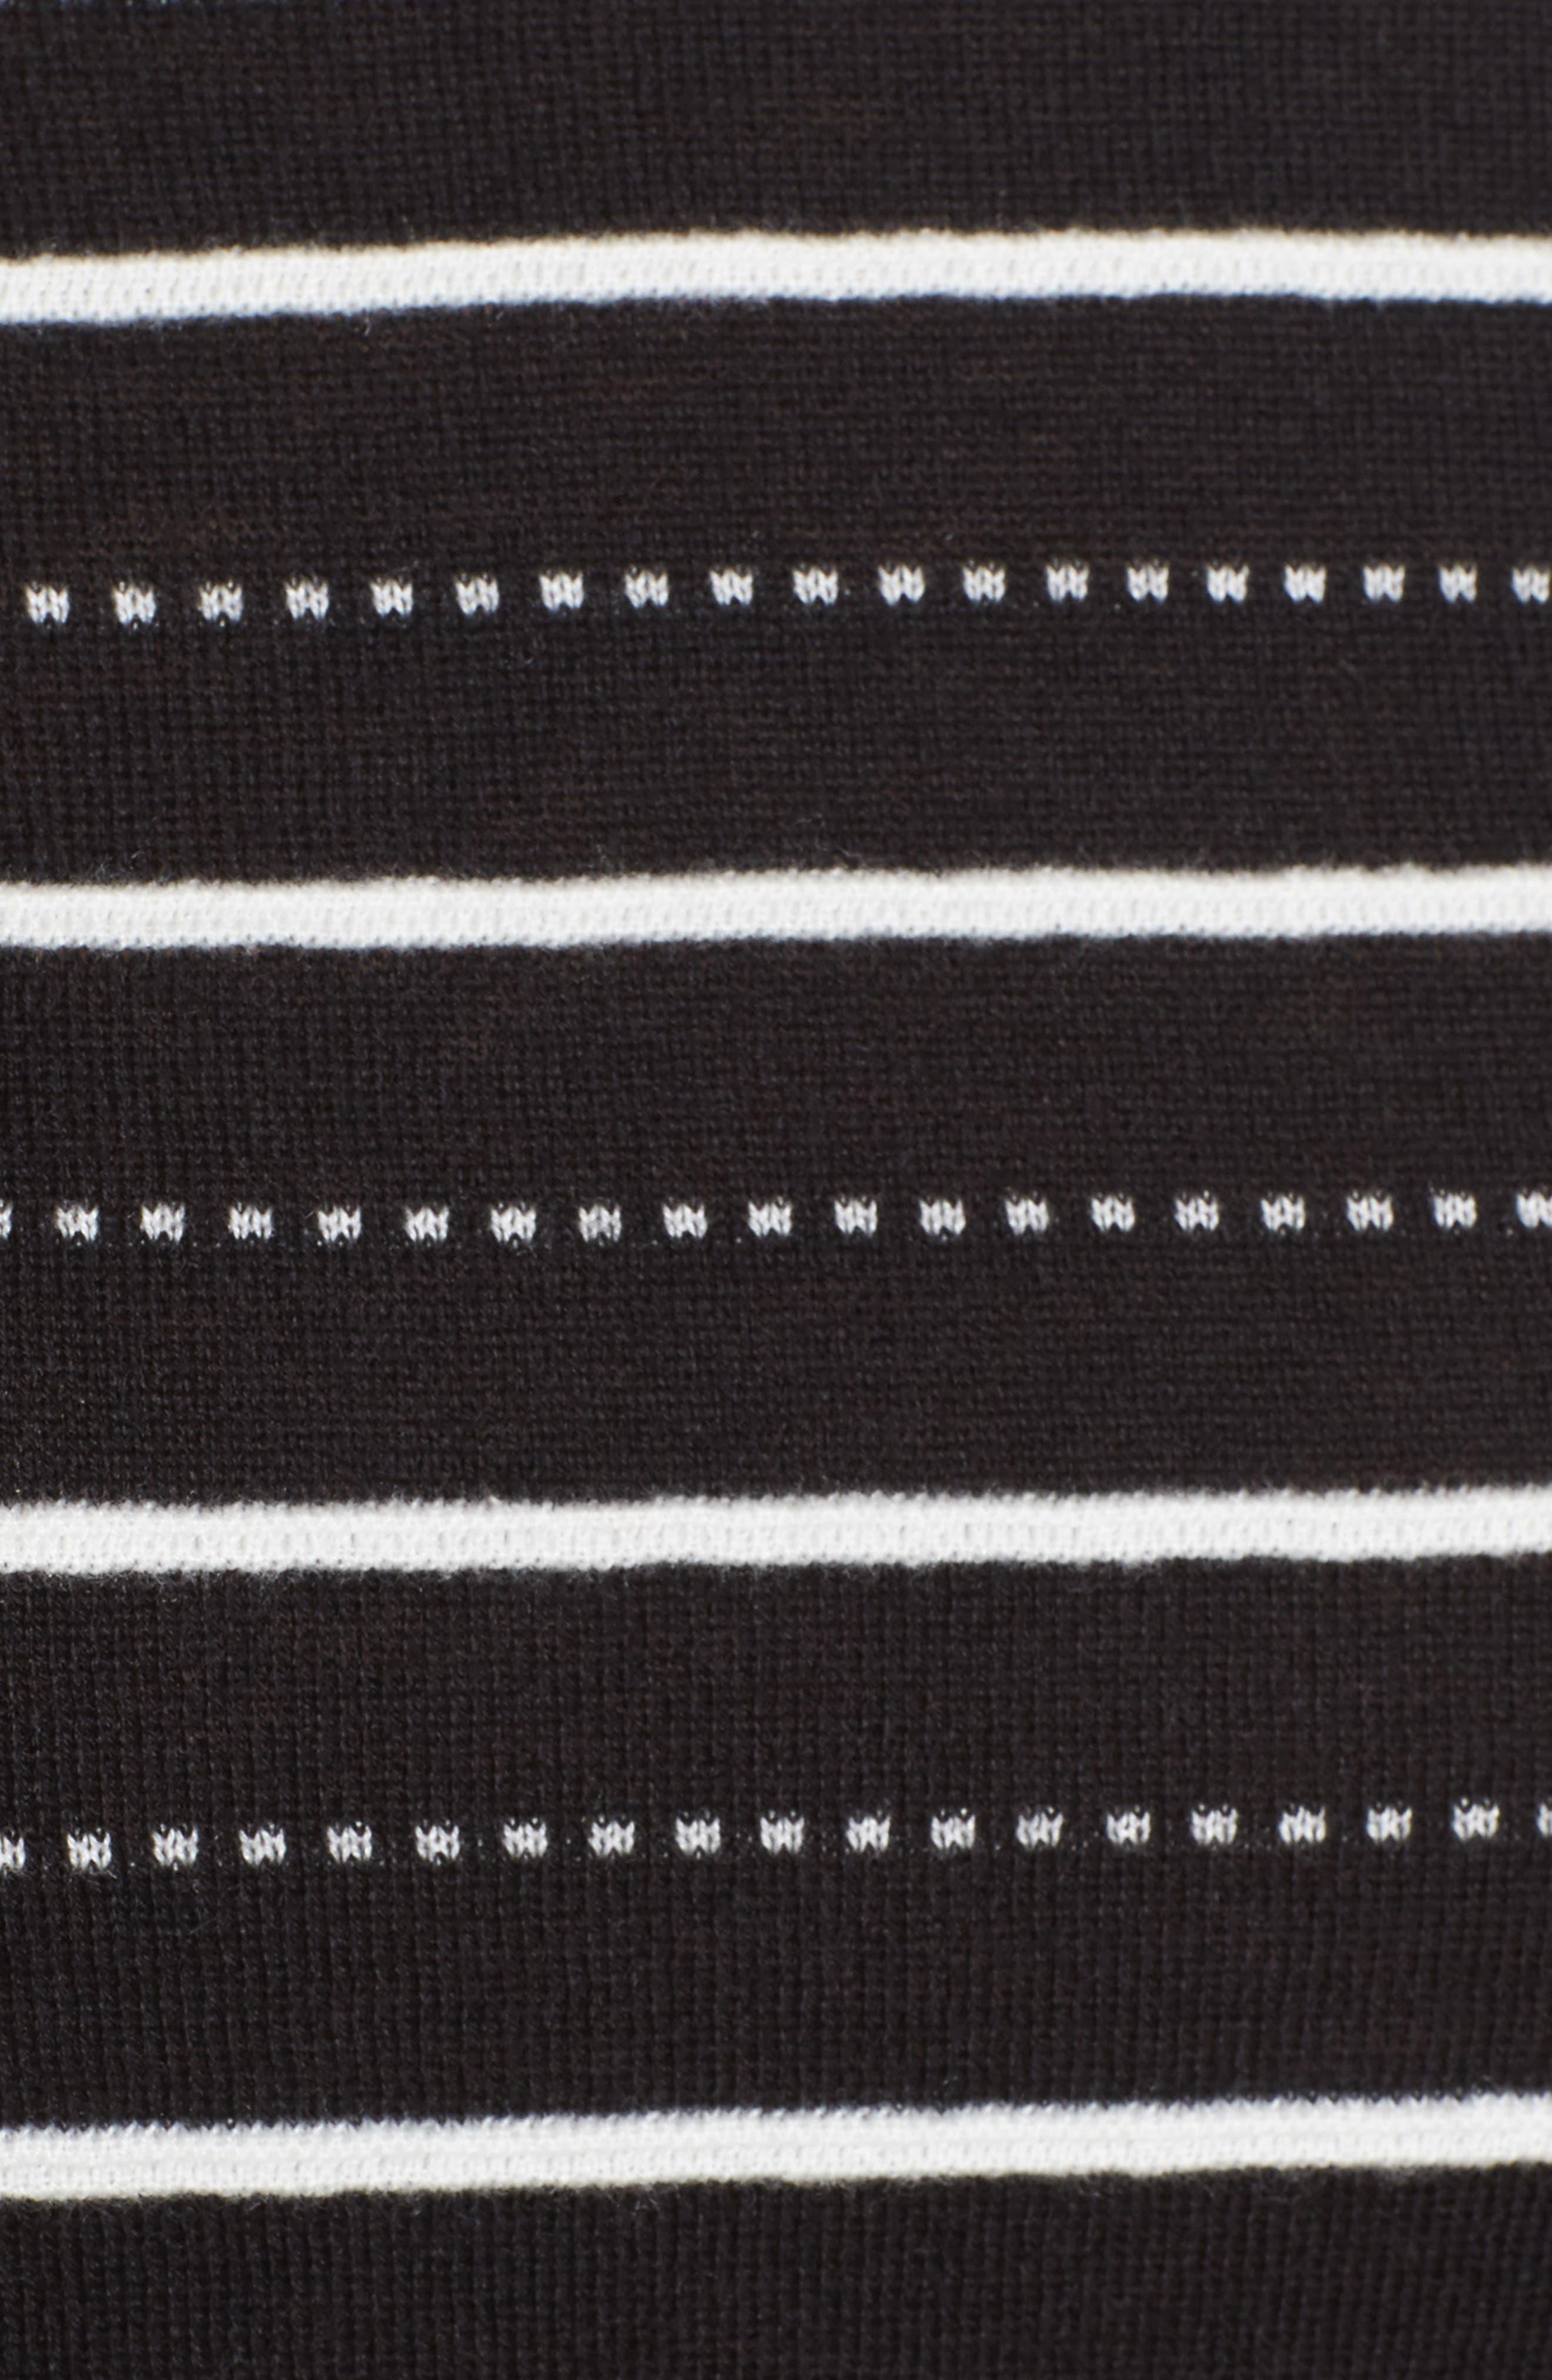 Cotton Blend Pullover,                             Alternate thumbnail 41, color,